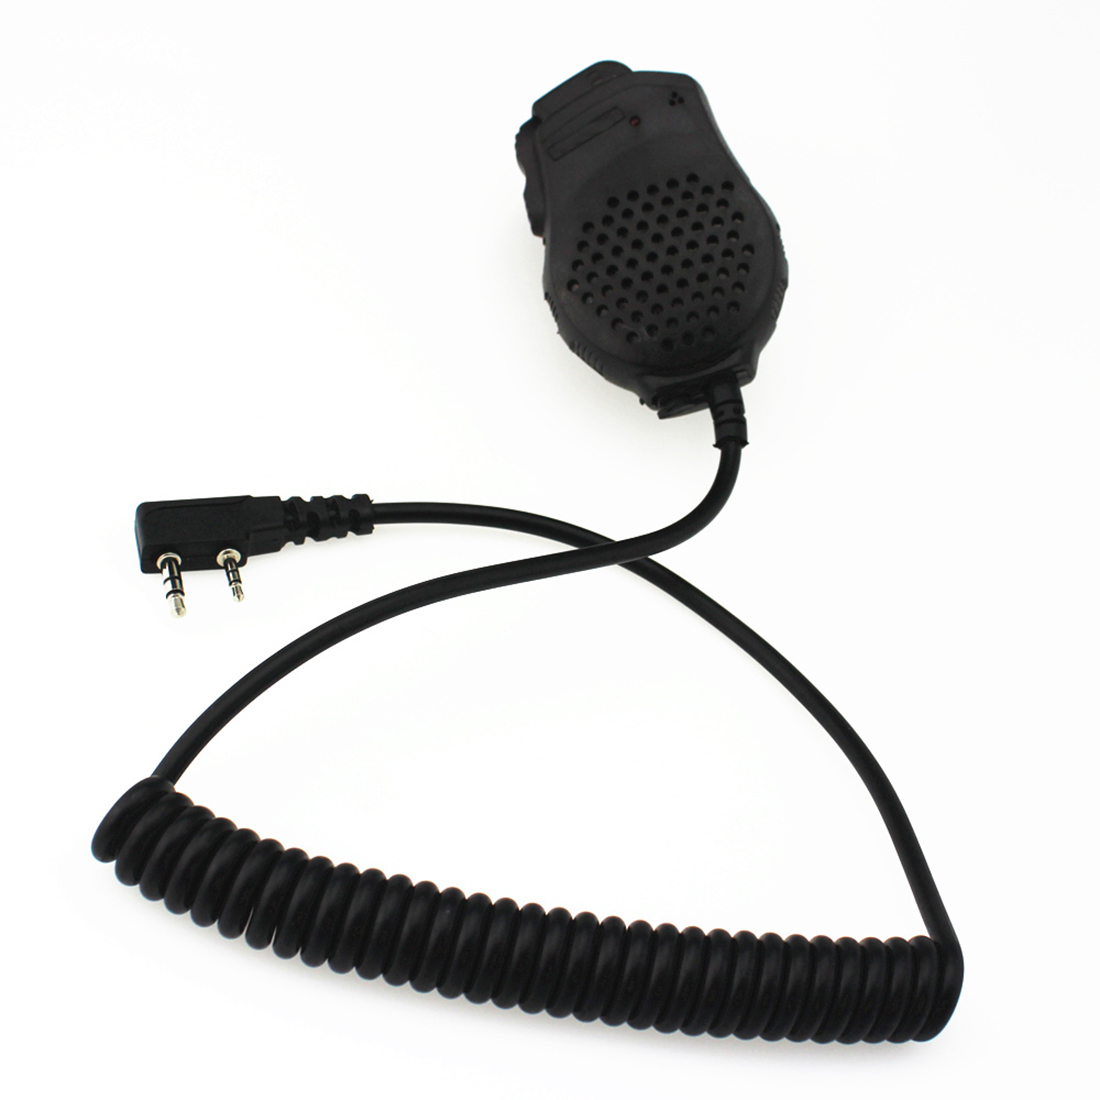 Haut-parleur Mic Microphone Double PTT Pour Baofeng Two Way Radio UV-82-82L uv UV-8D UV-89 UV-82HP Série Portable Radio